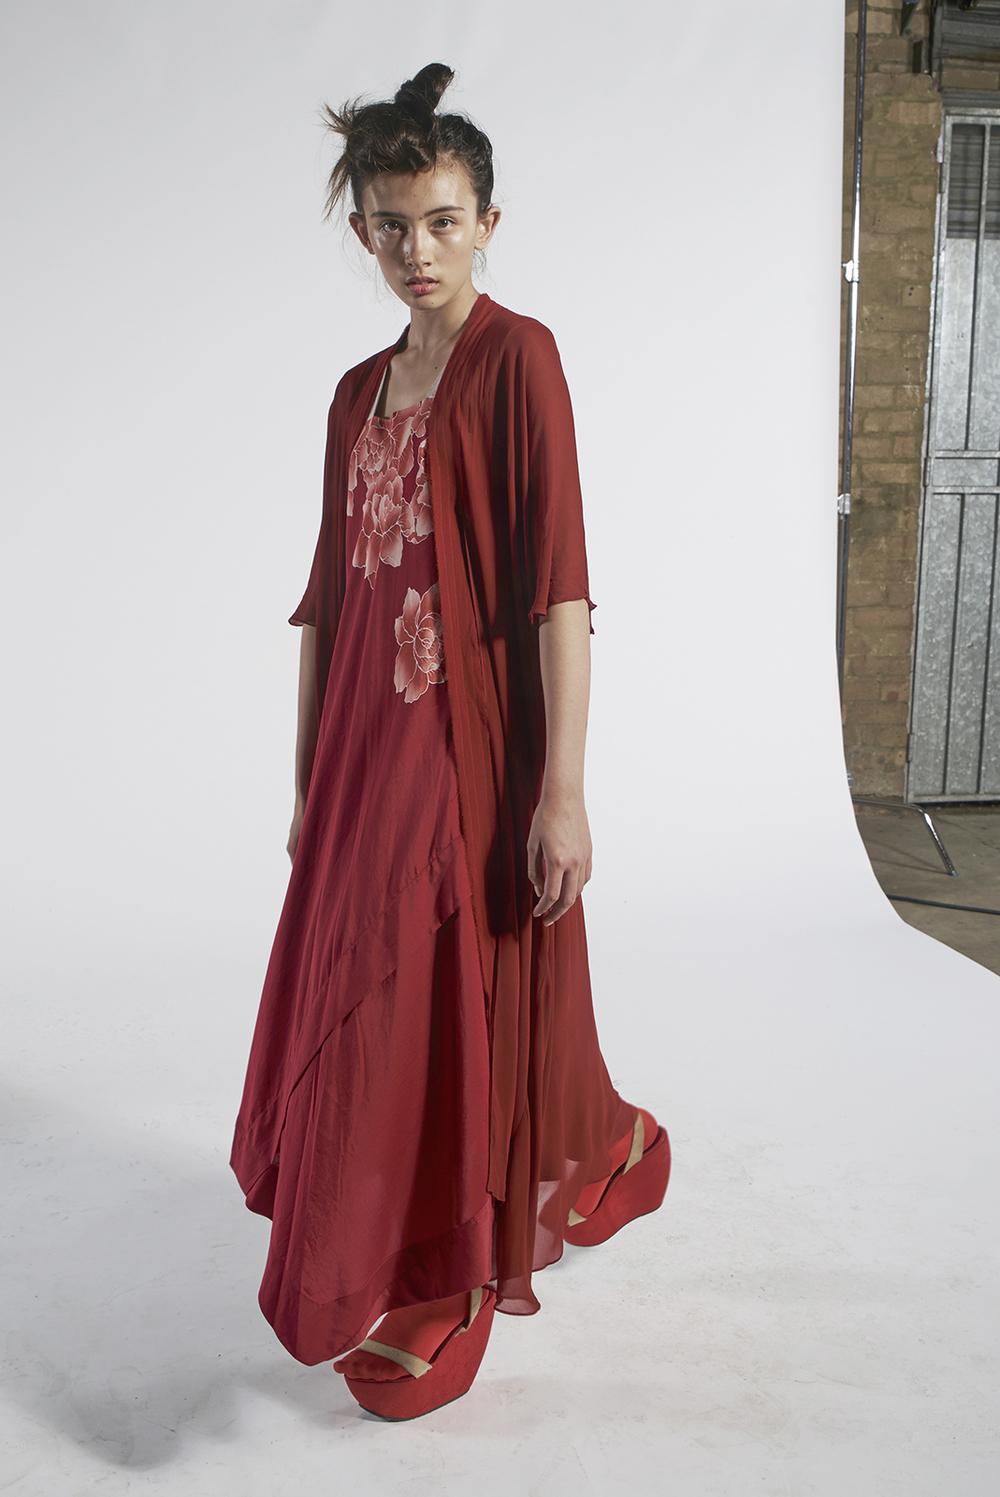 235/A151152 Tie Kimono 591/A151572 Hand Painted Peony Strap Dress